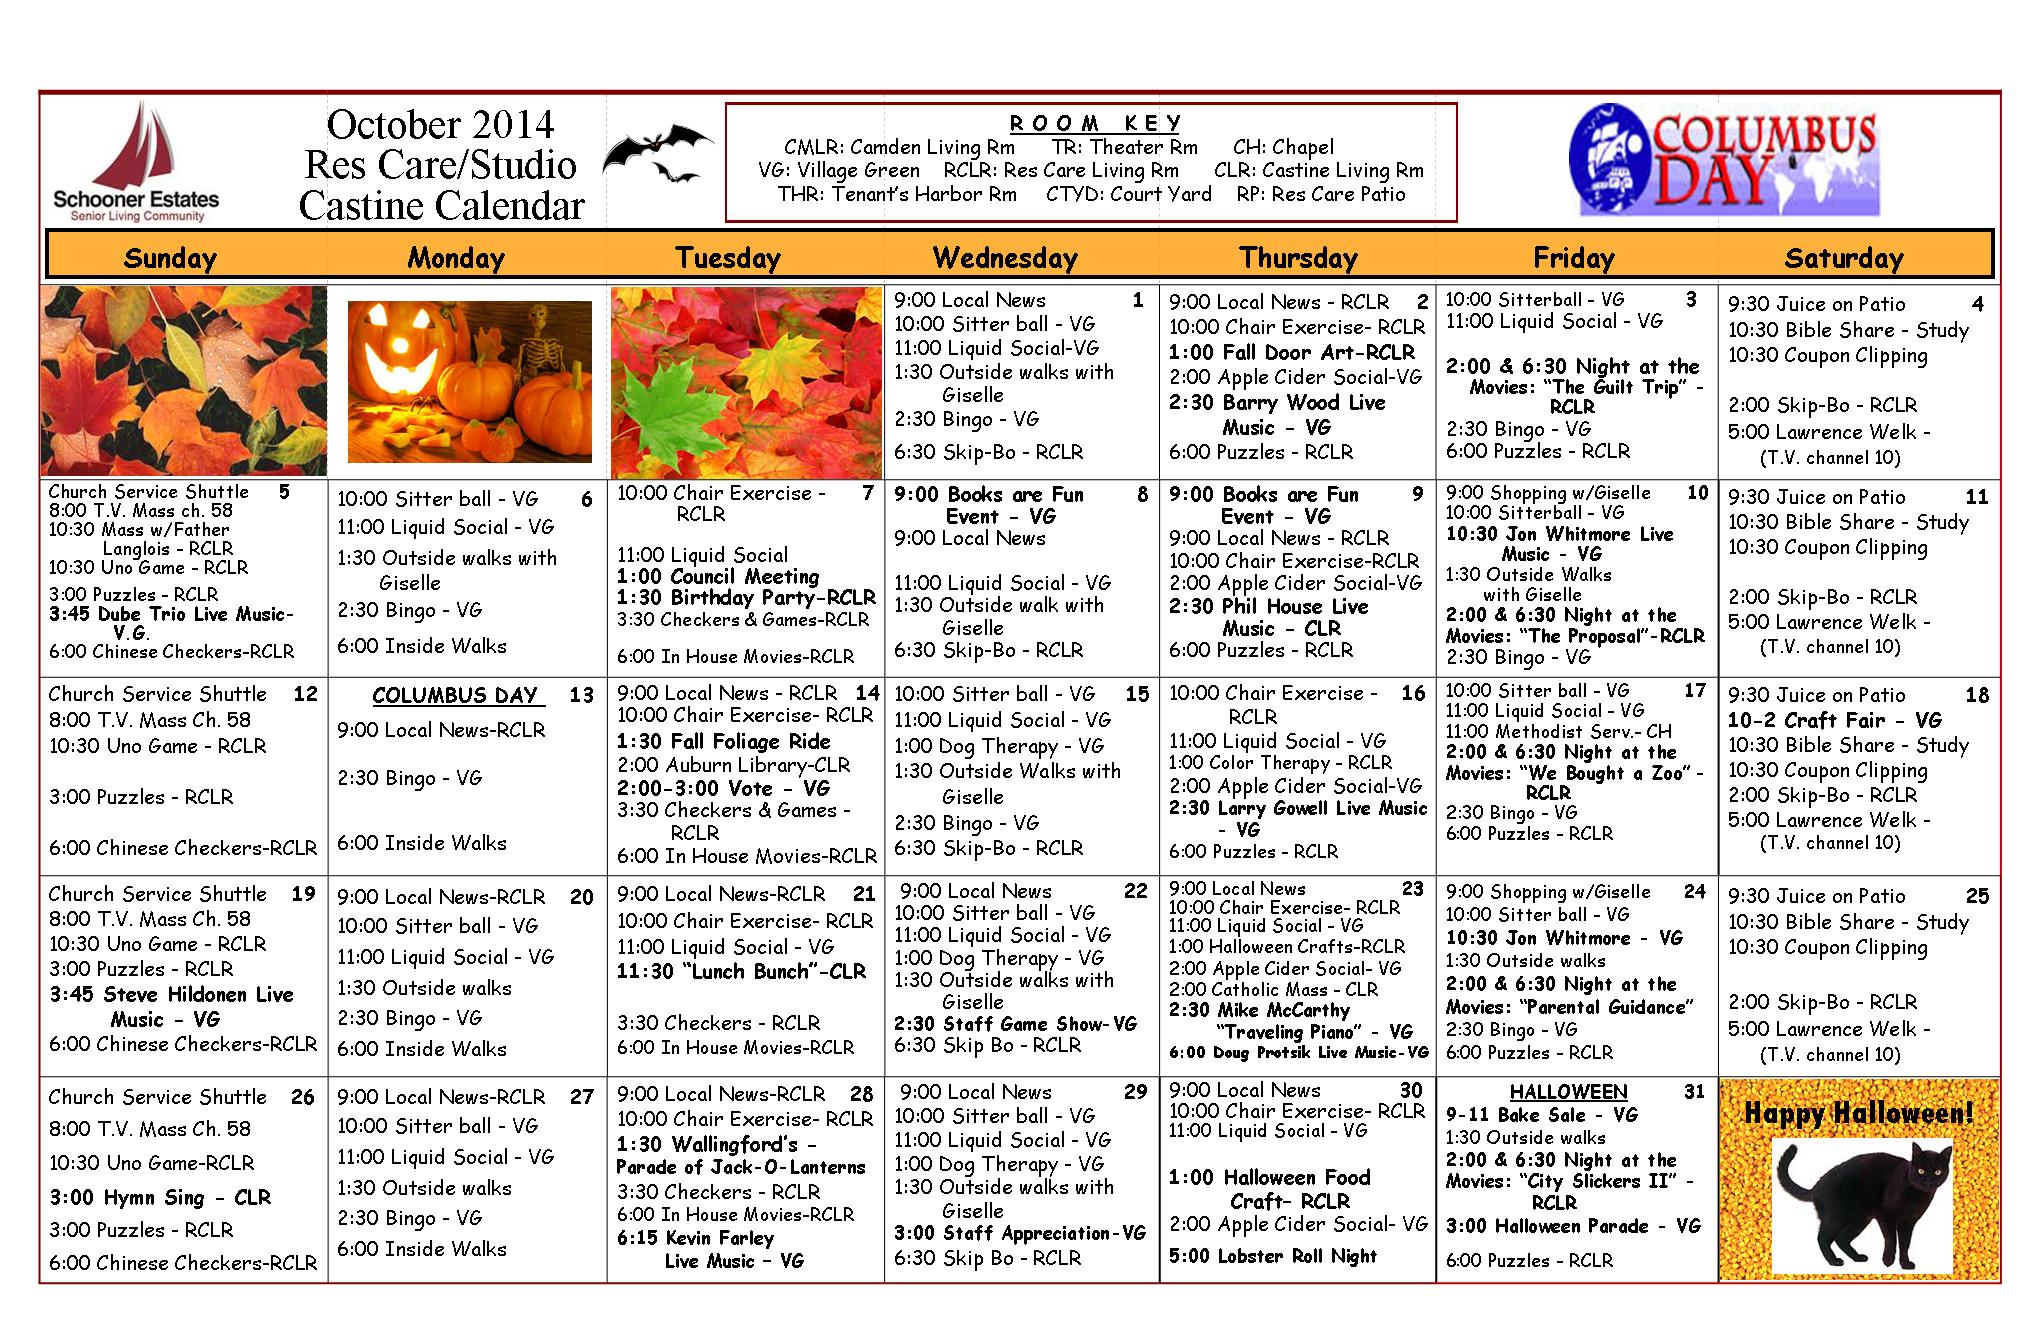 October 2014 Castine - Residential Care Calendar